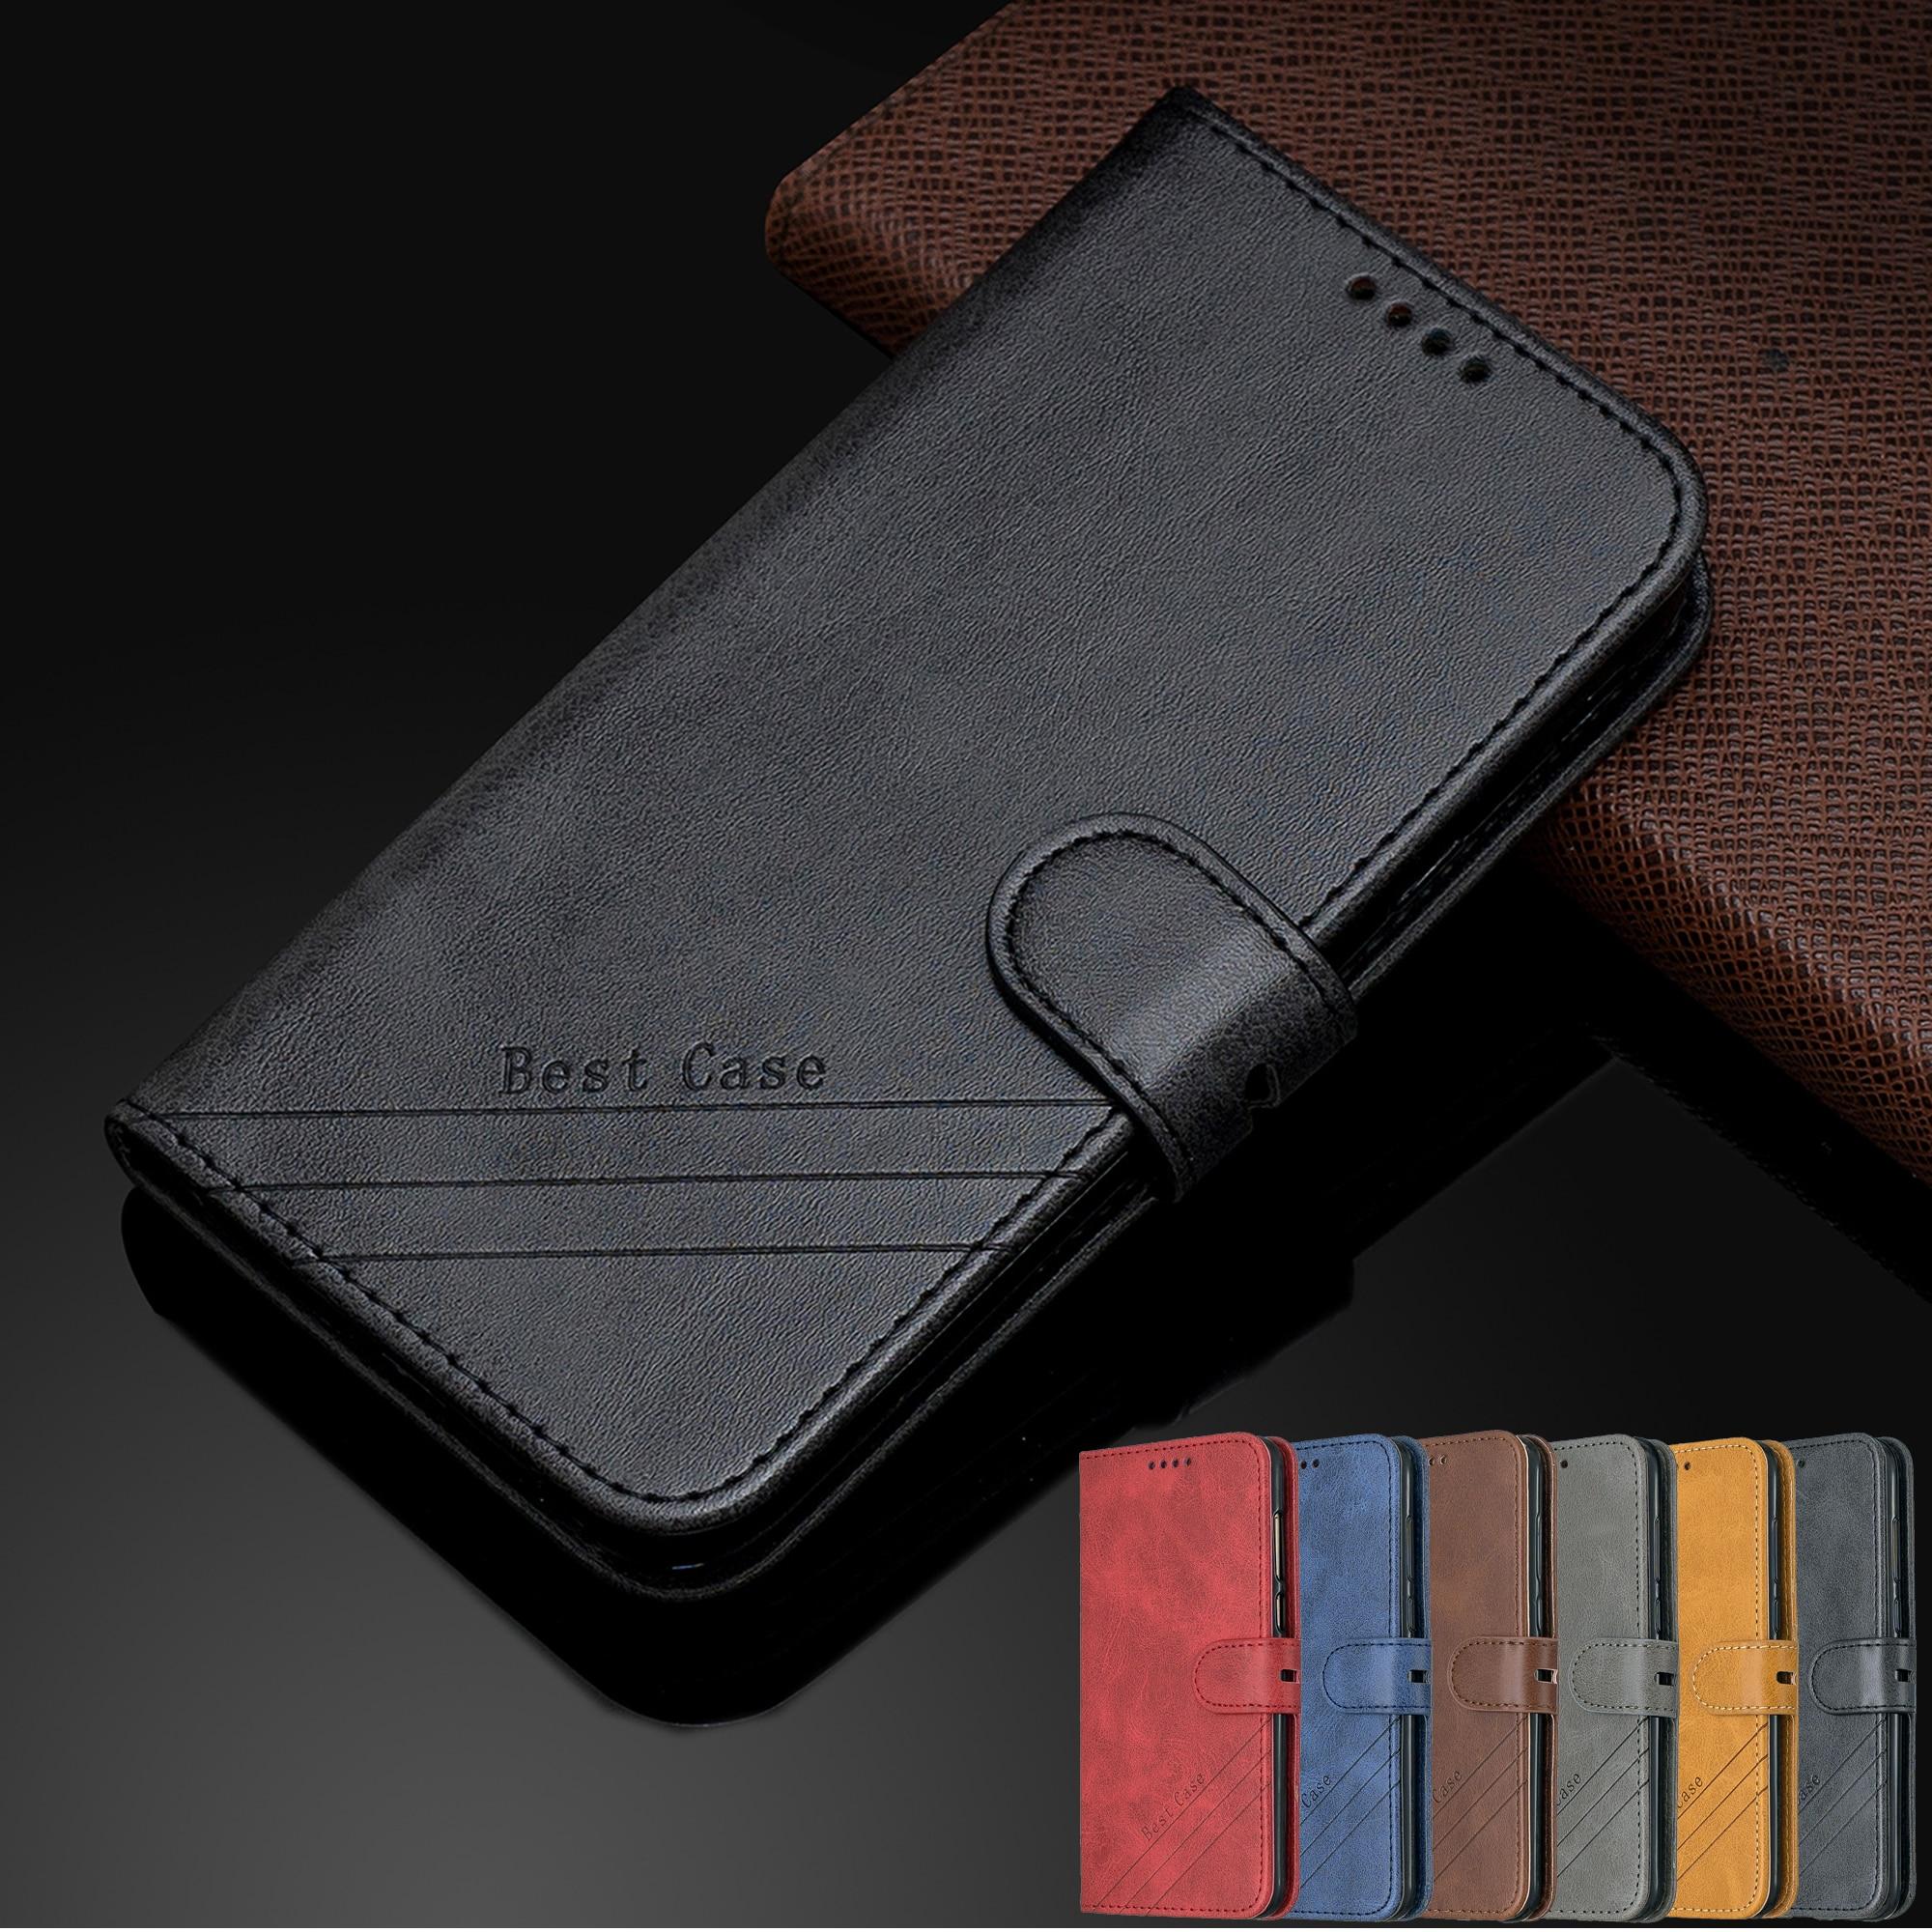 A20S Coque à rabat pour Samsung Galaxy a20s A20 A30 A10 A50 S A 20S housse de SM-A207F capa pour Samsung A20E A20 A205F étui en cuir